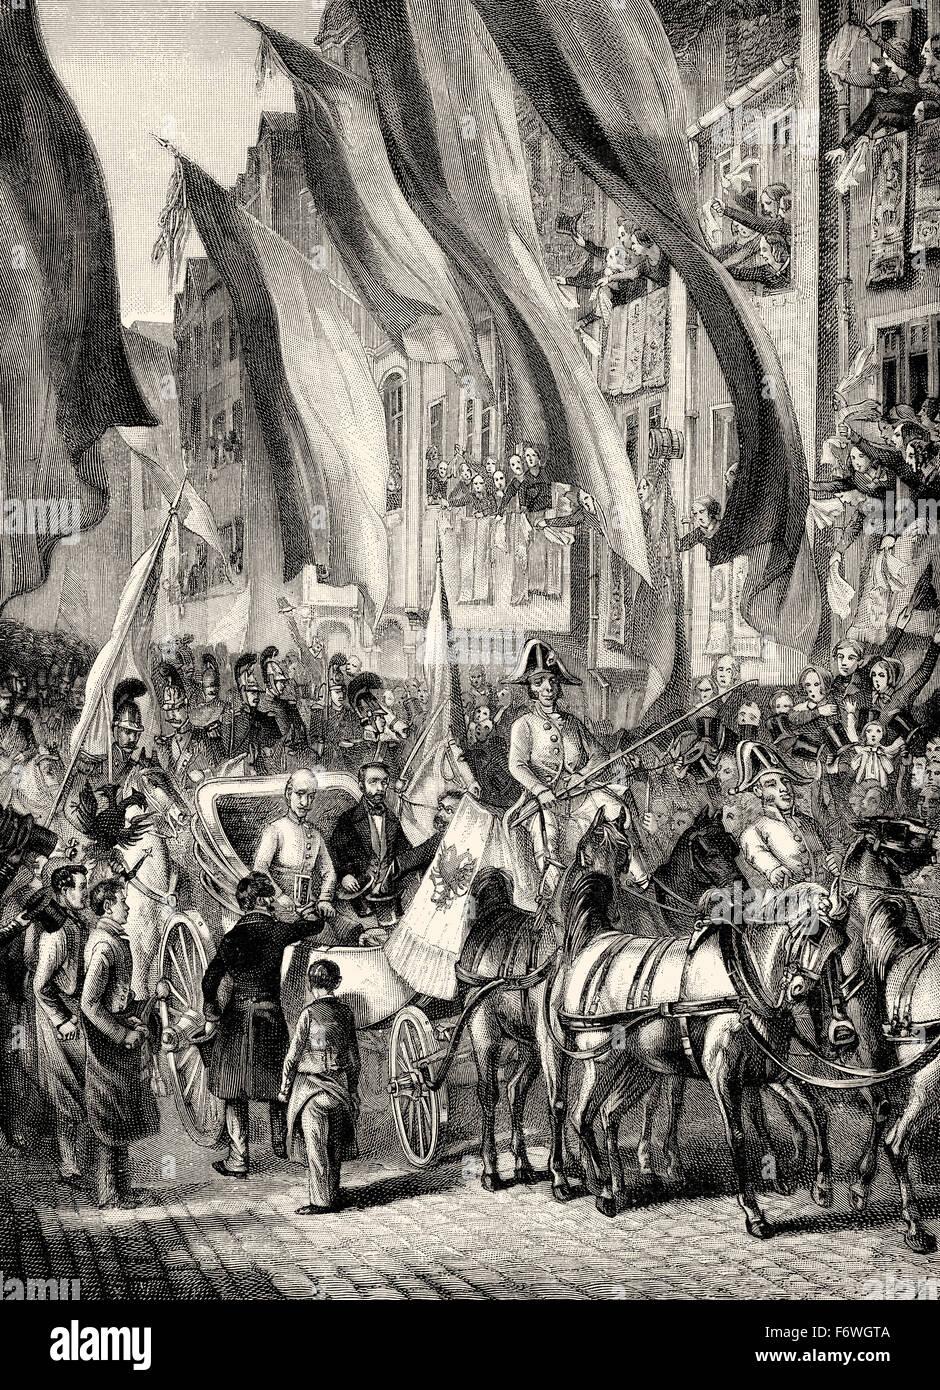 Archduke John of Austria, 1782 - 1859, an Austrian field marshal, arrival as German Imperial regent in Frankfurt - Stock Image